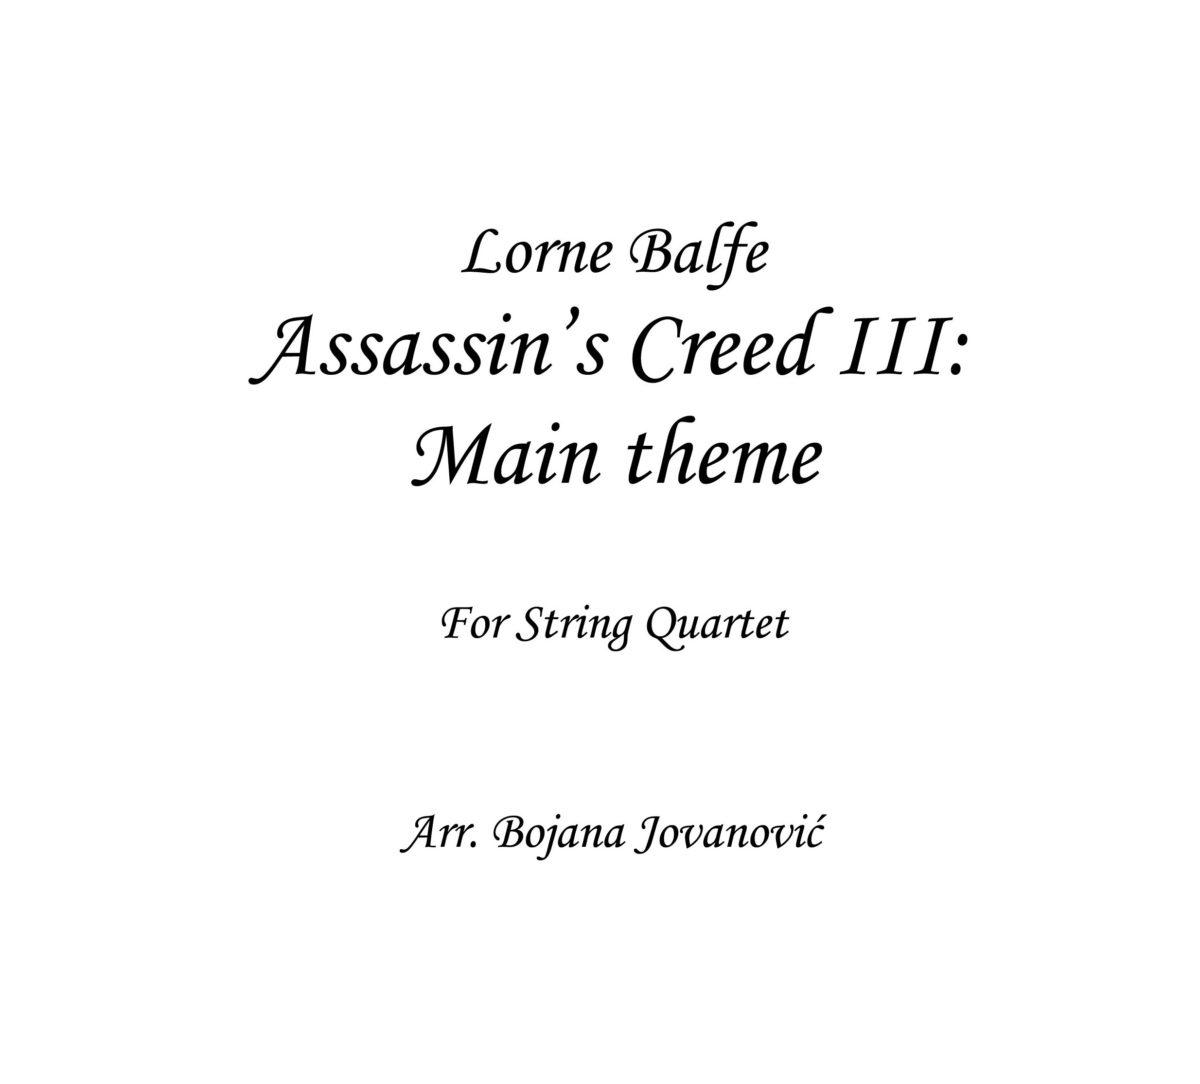 Assassin's Creed III: main theme (Lorne Balfe) - Sheet Music